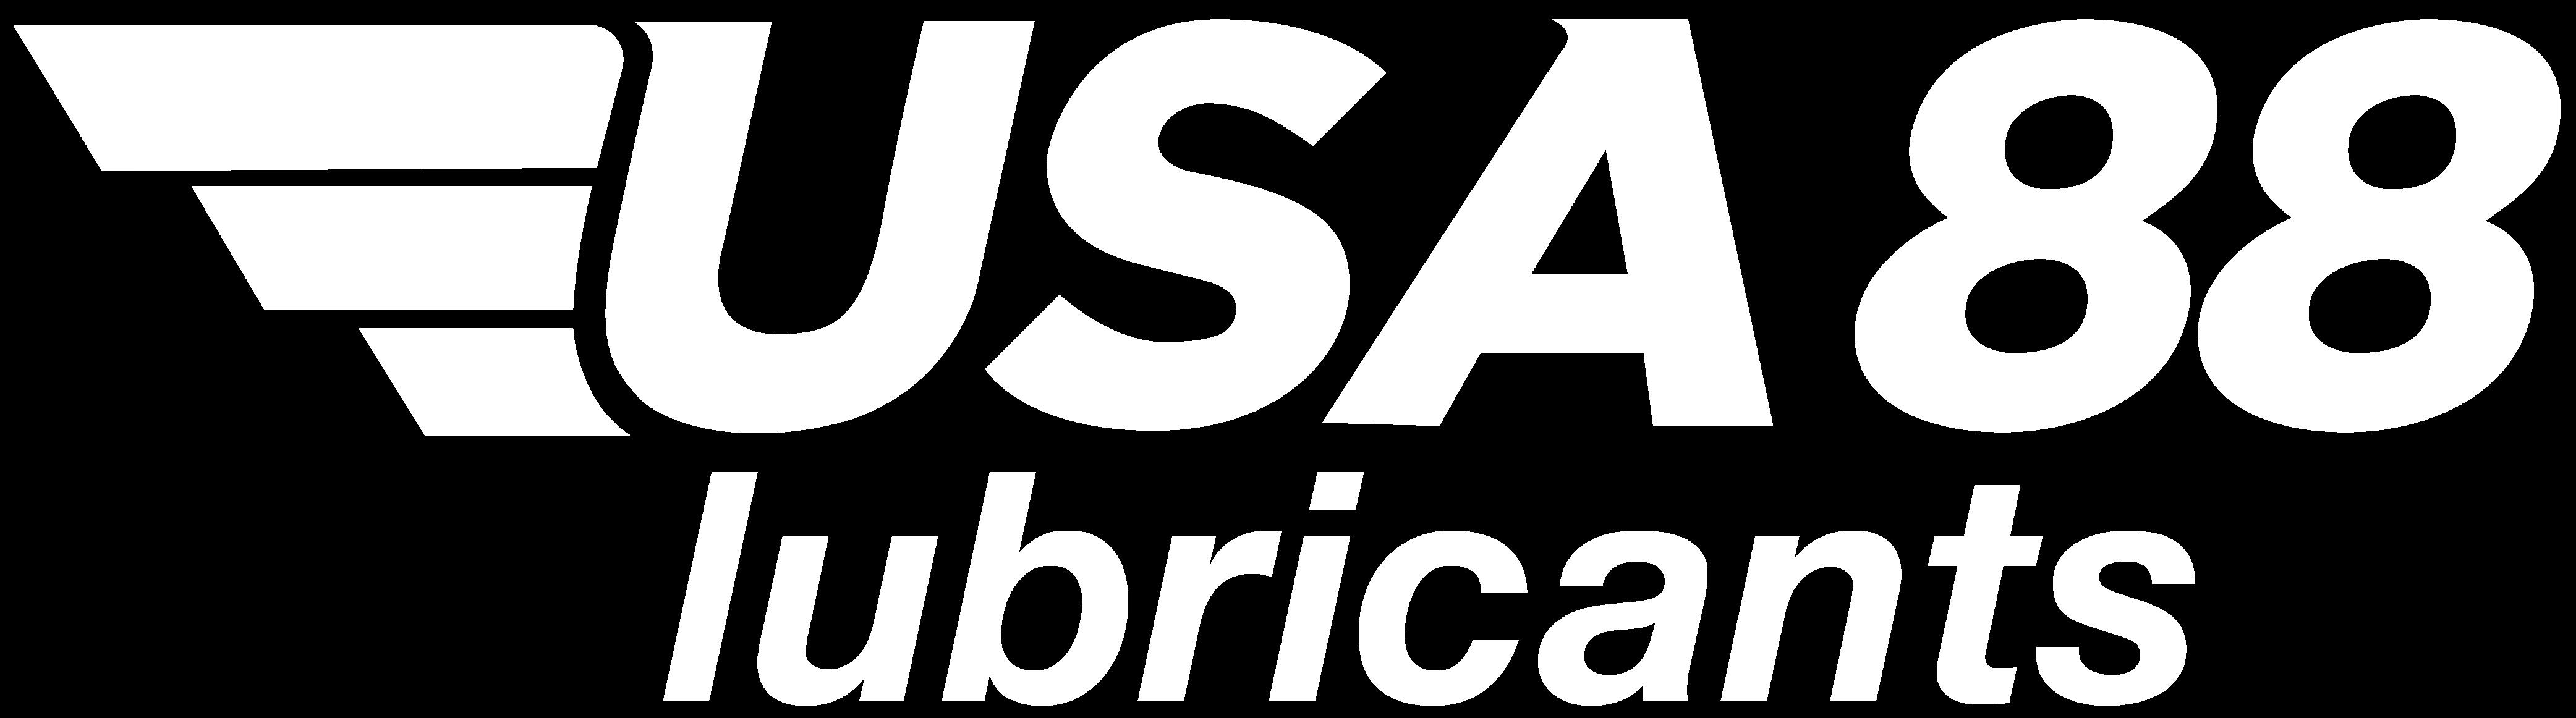 USA88 Lubricants